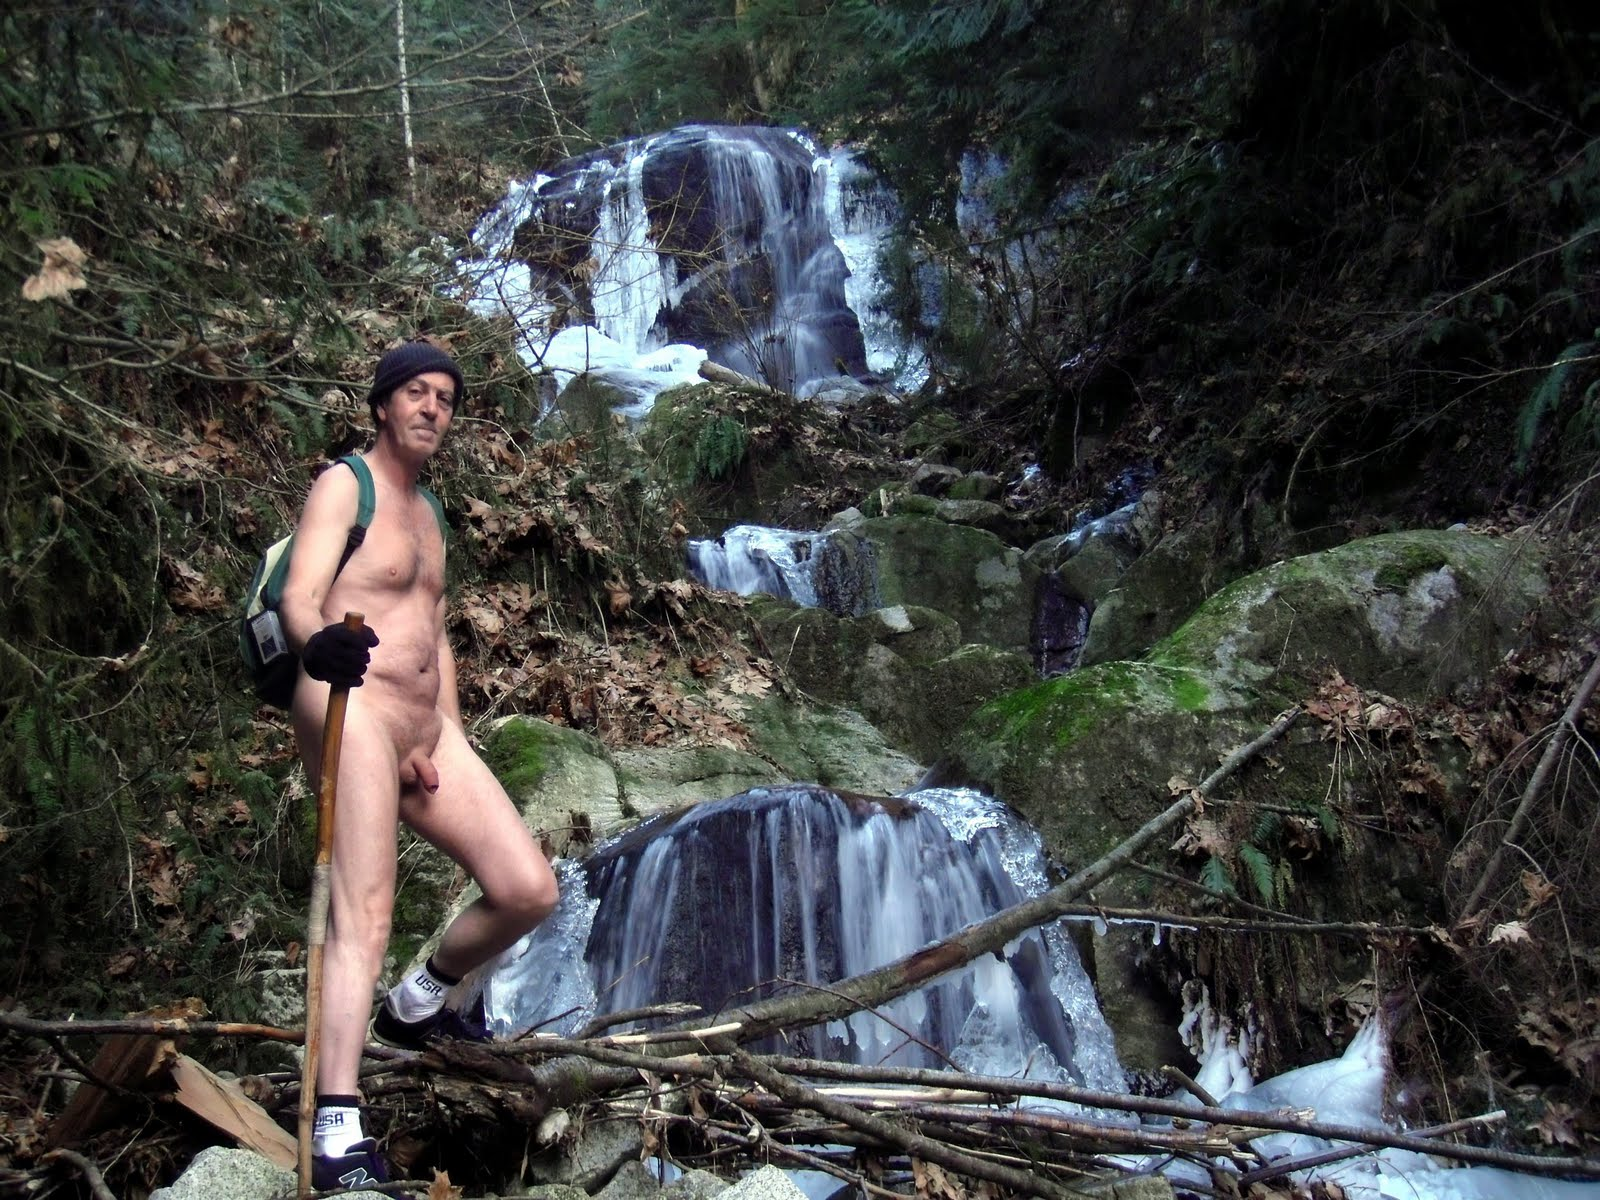 Canyon Creek Falls Nude Hike